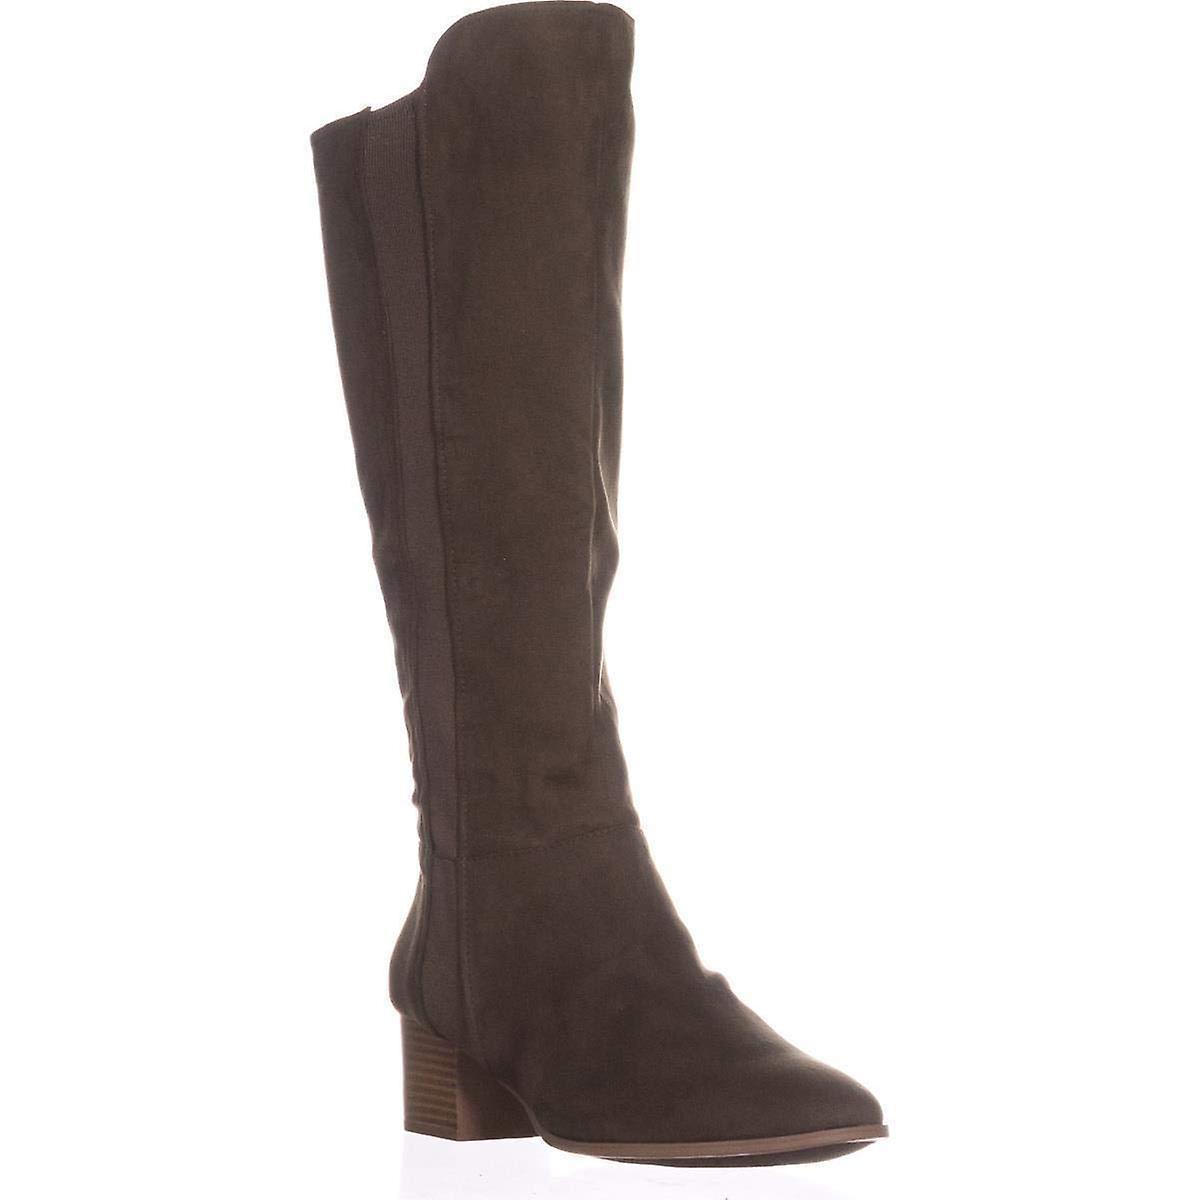 Stil & Co Finnly tall Boots furu størrelse 5.5 M